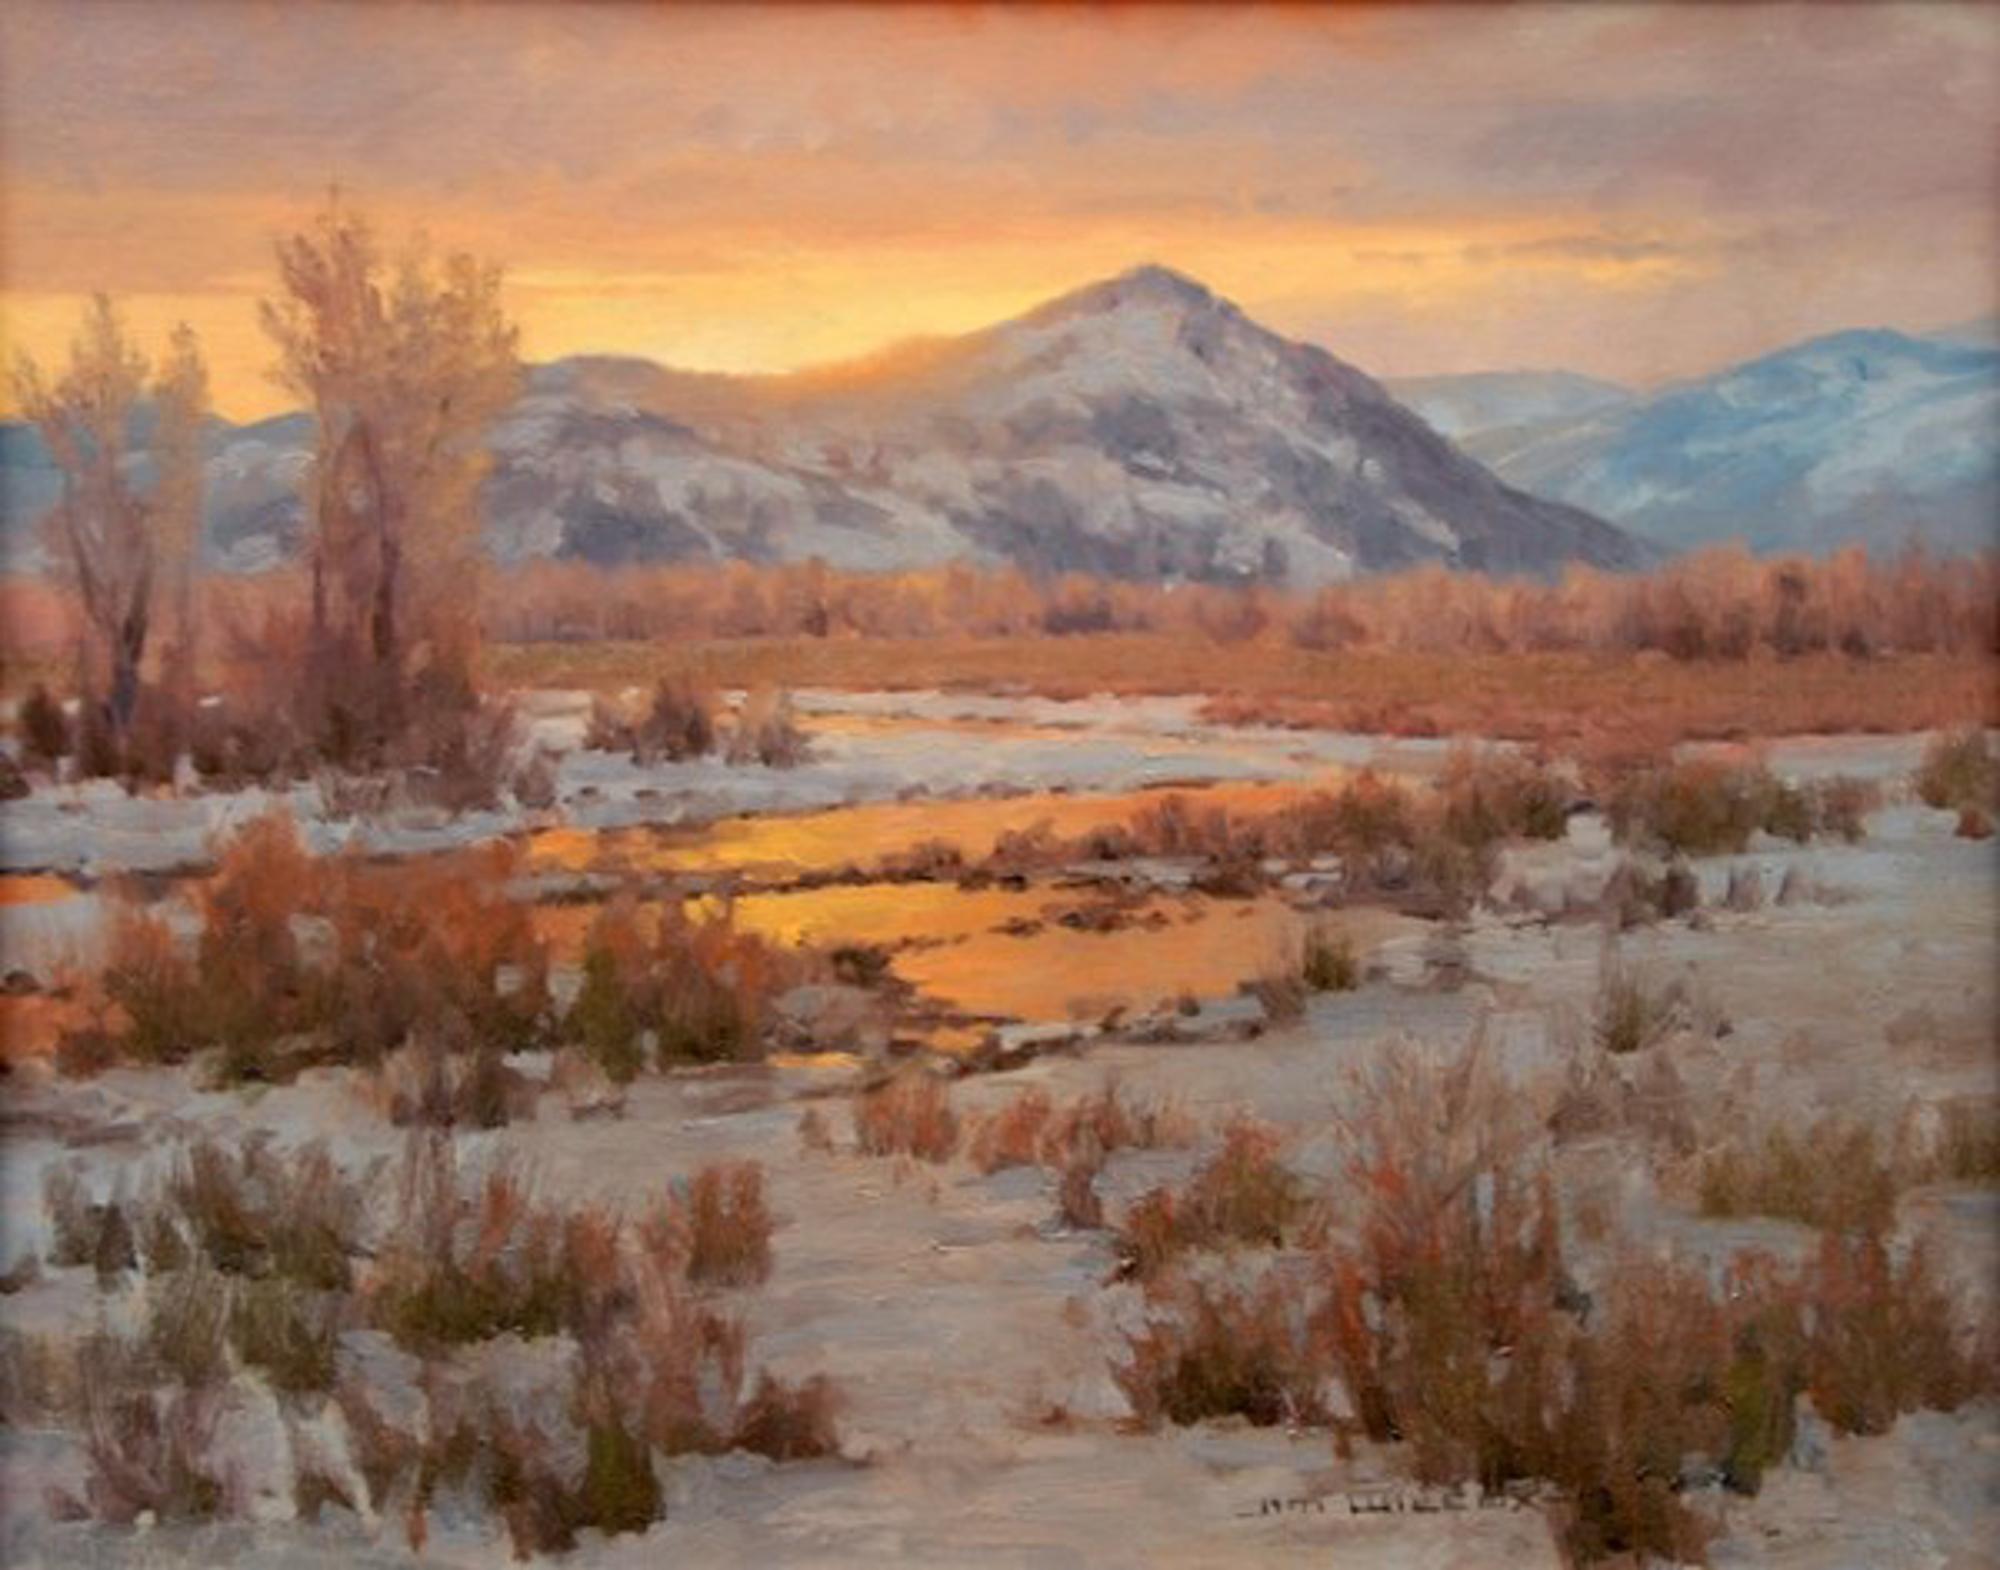 One Last Wink by Jim Wilcox